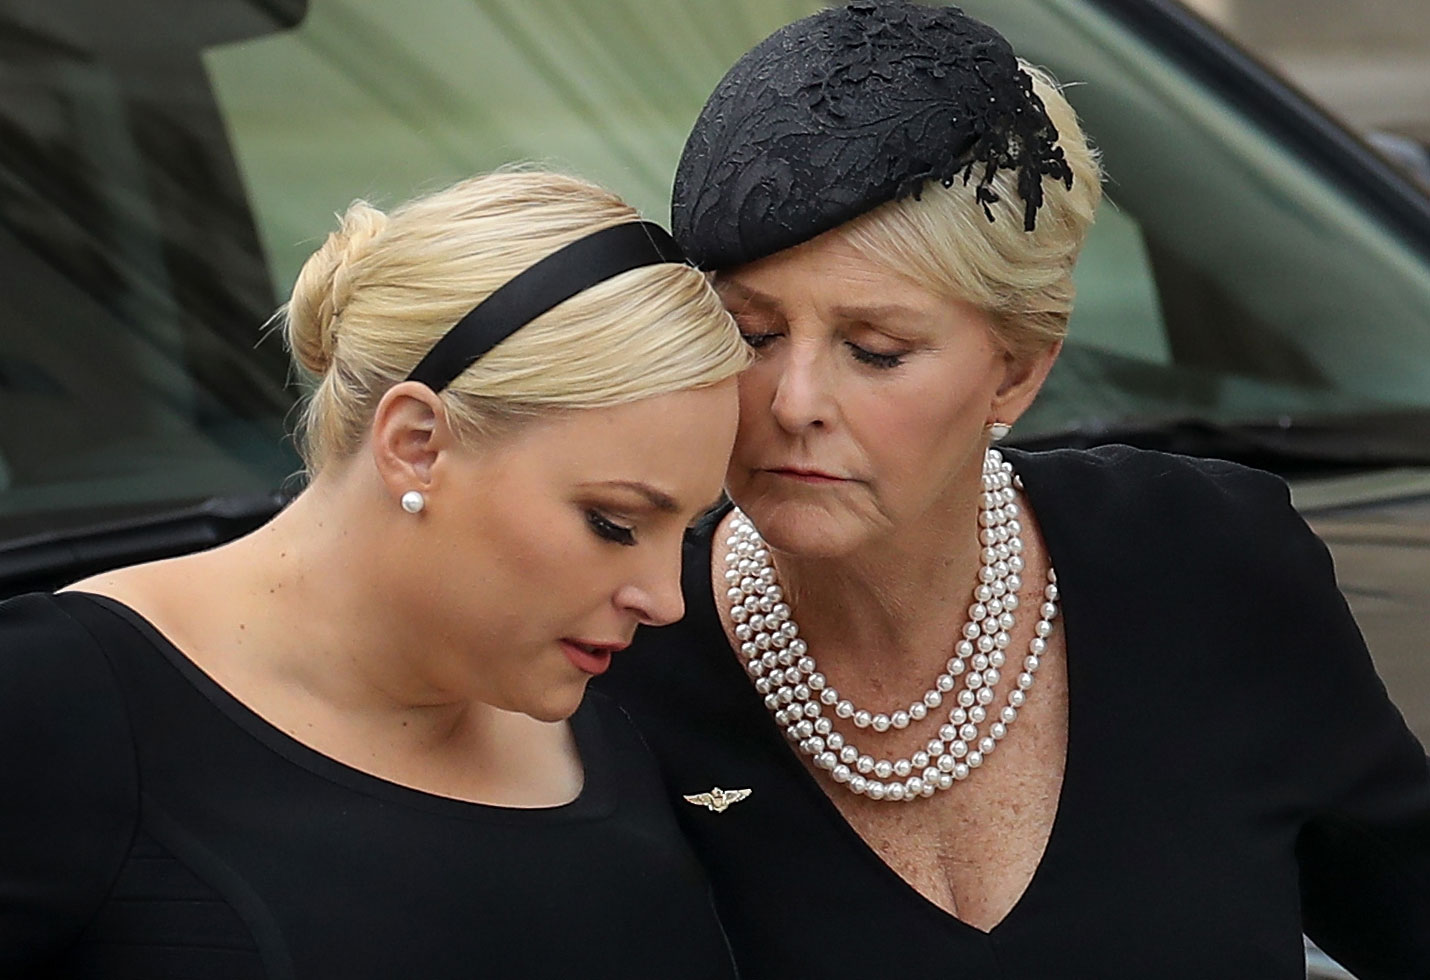 Kardinaal Danneels News: Meghan McCain Thanks Mom Cindy For Helping Her Through